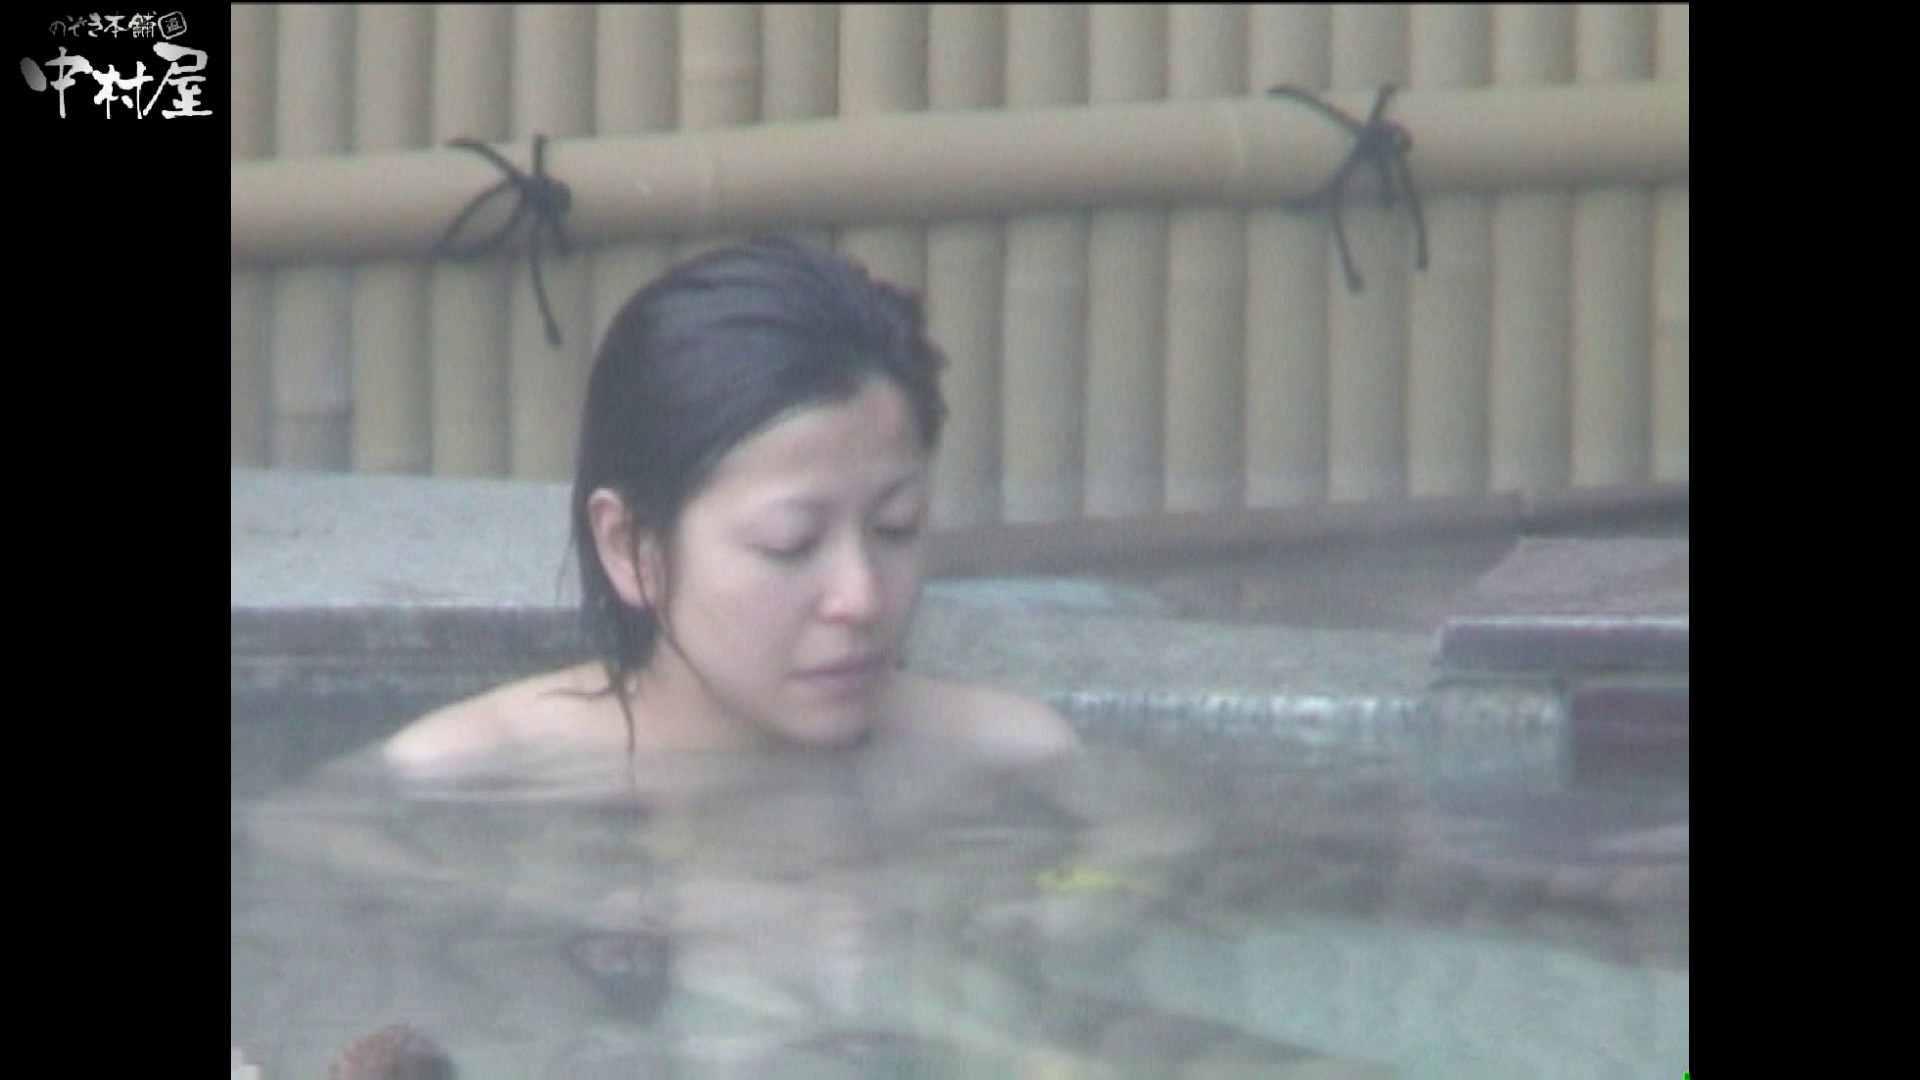 Aquaな露天風呂Vol.986 盗撮  94連発 43